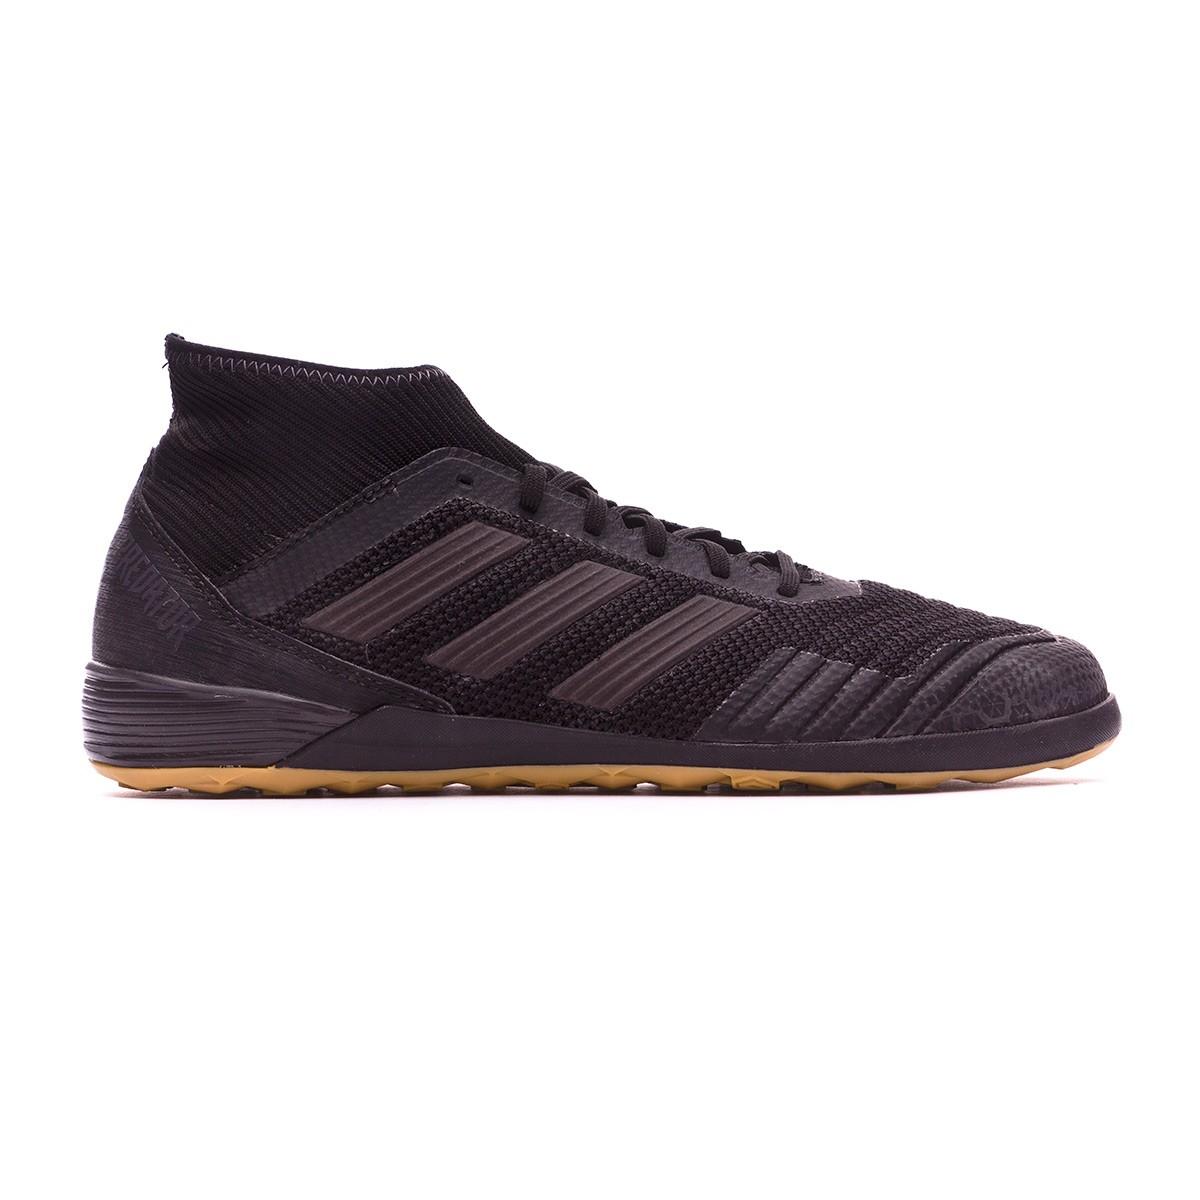 18 Black Chaussure Futsal Adidas Core De Predator 3 In Real Tango CQrxodeWB